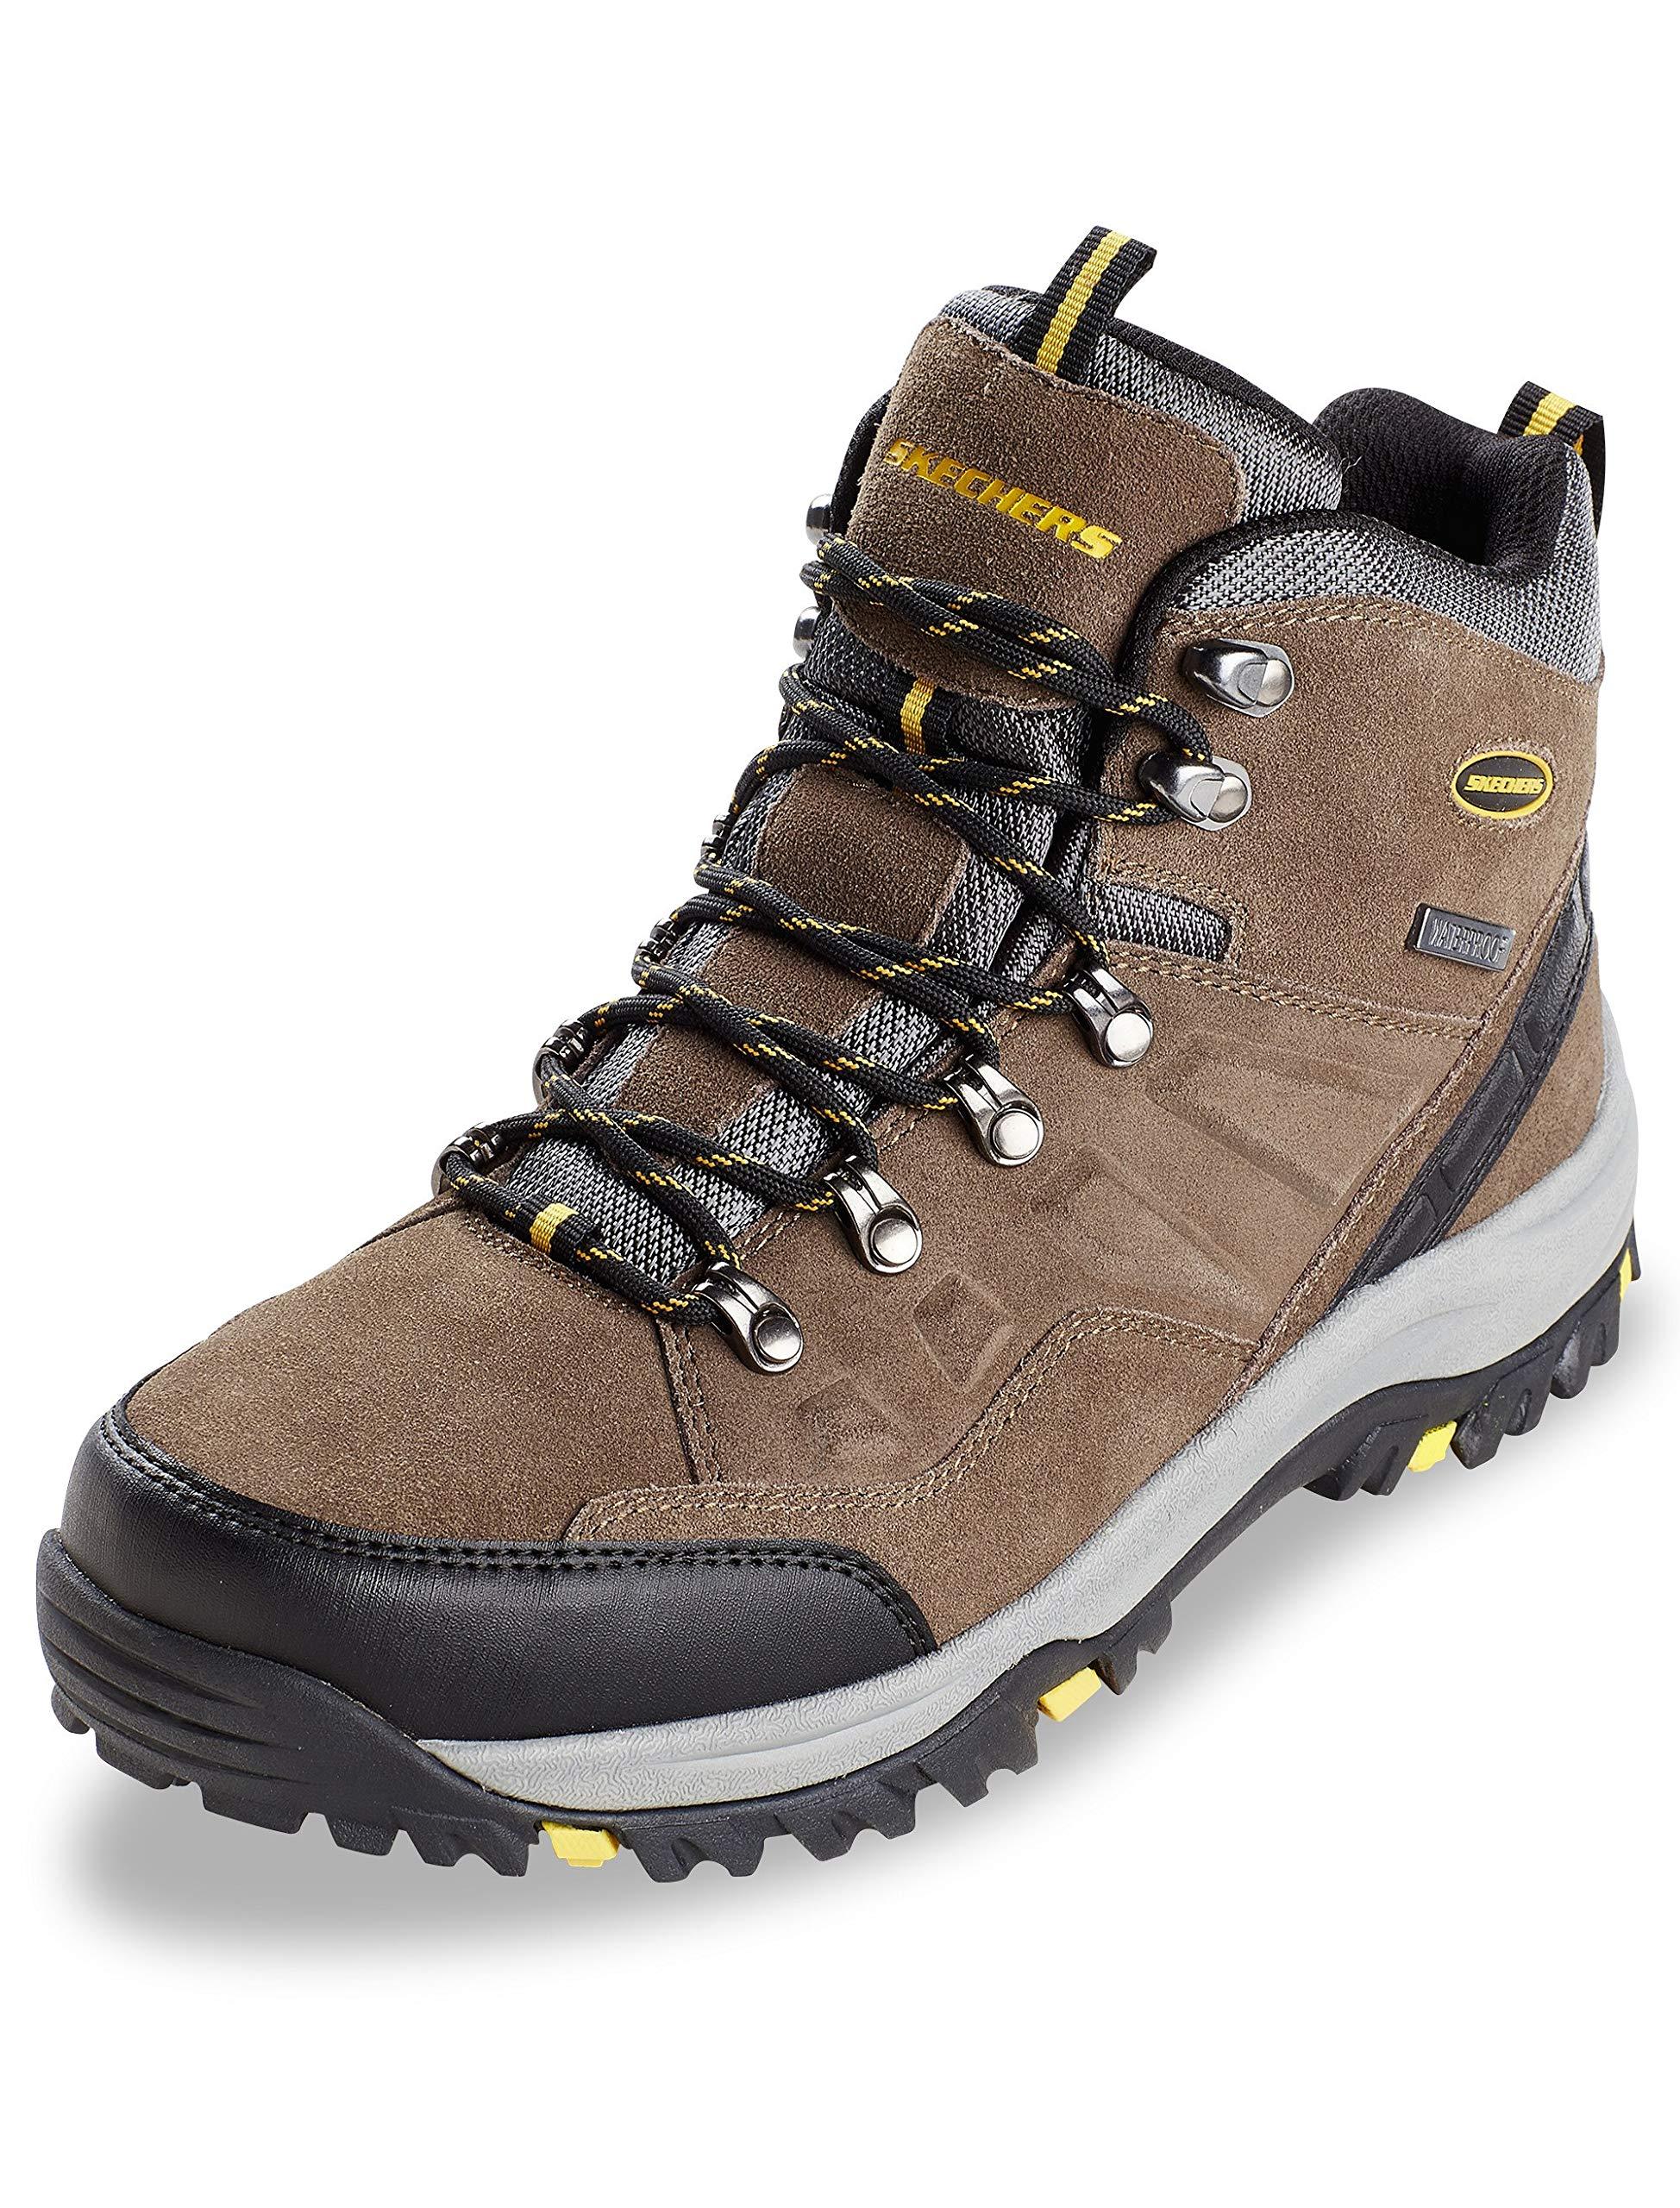 Skechers Men's Relaxed Fit Relment Pelmo Hiking Boot,Khaki,US 15 W